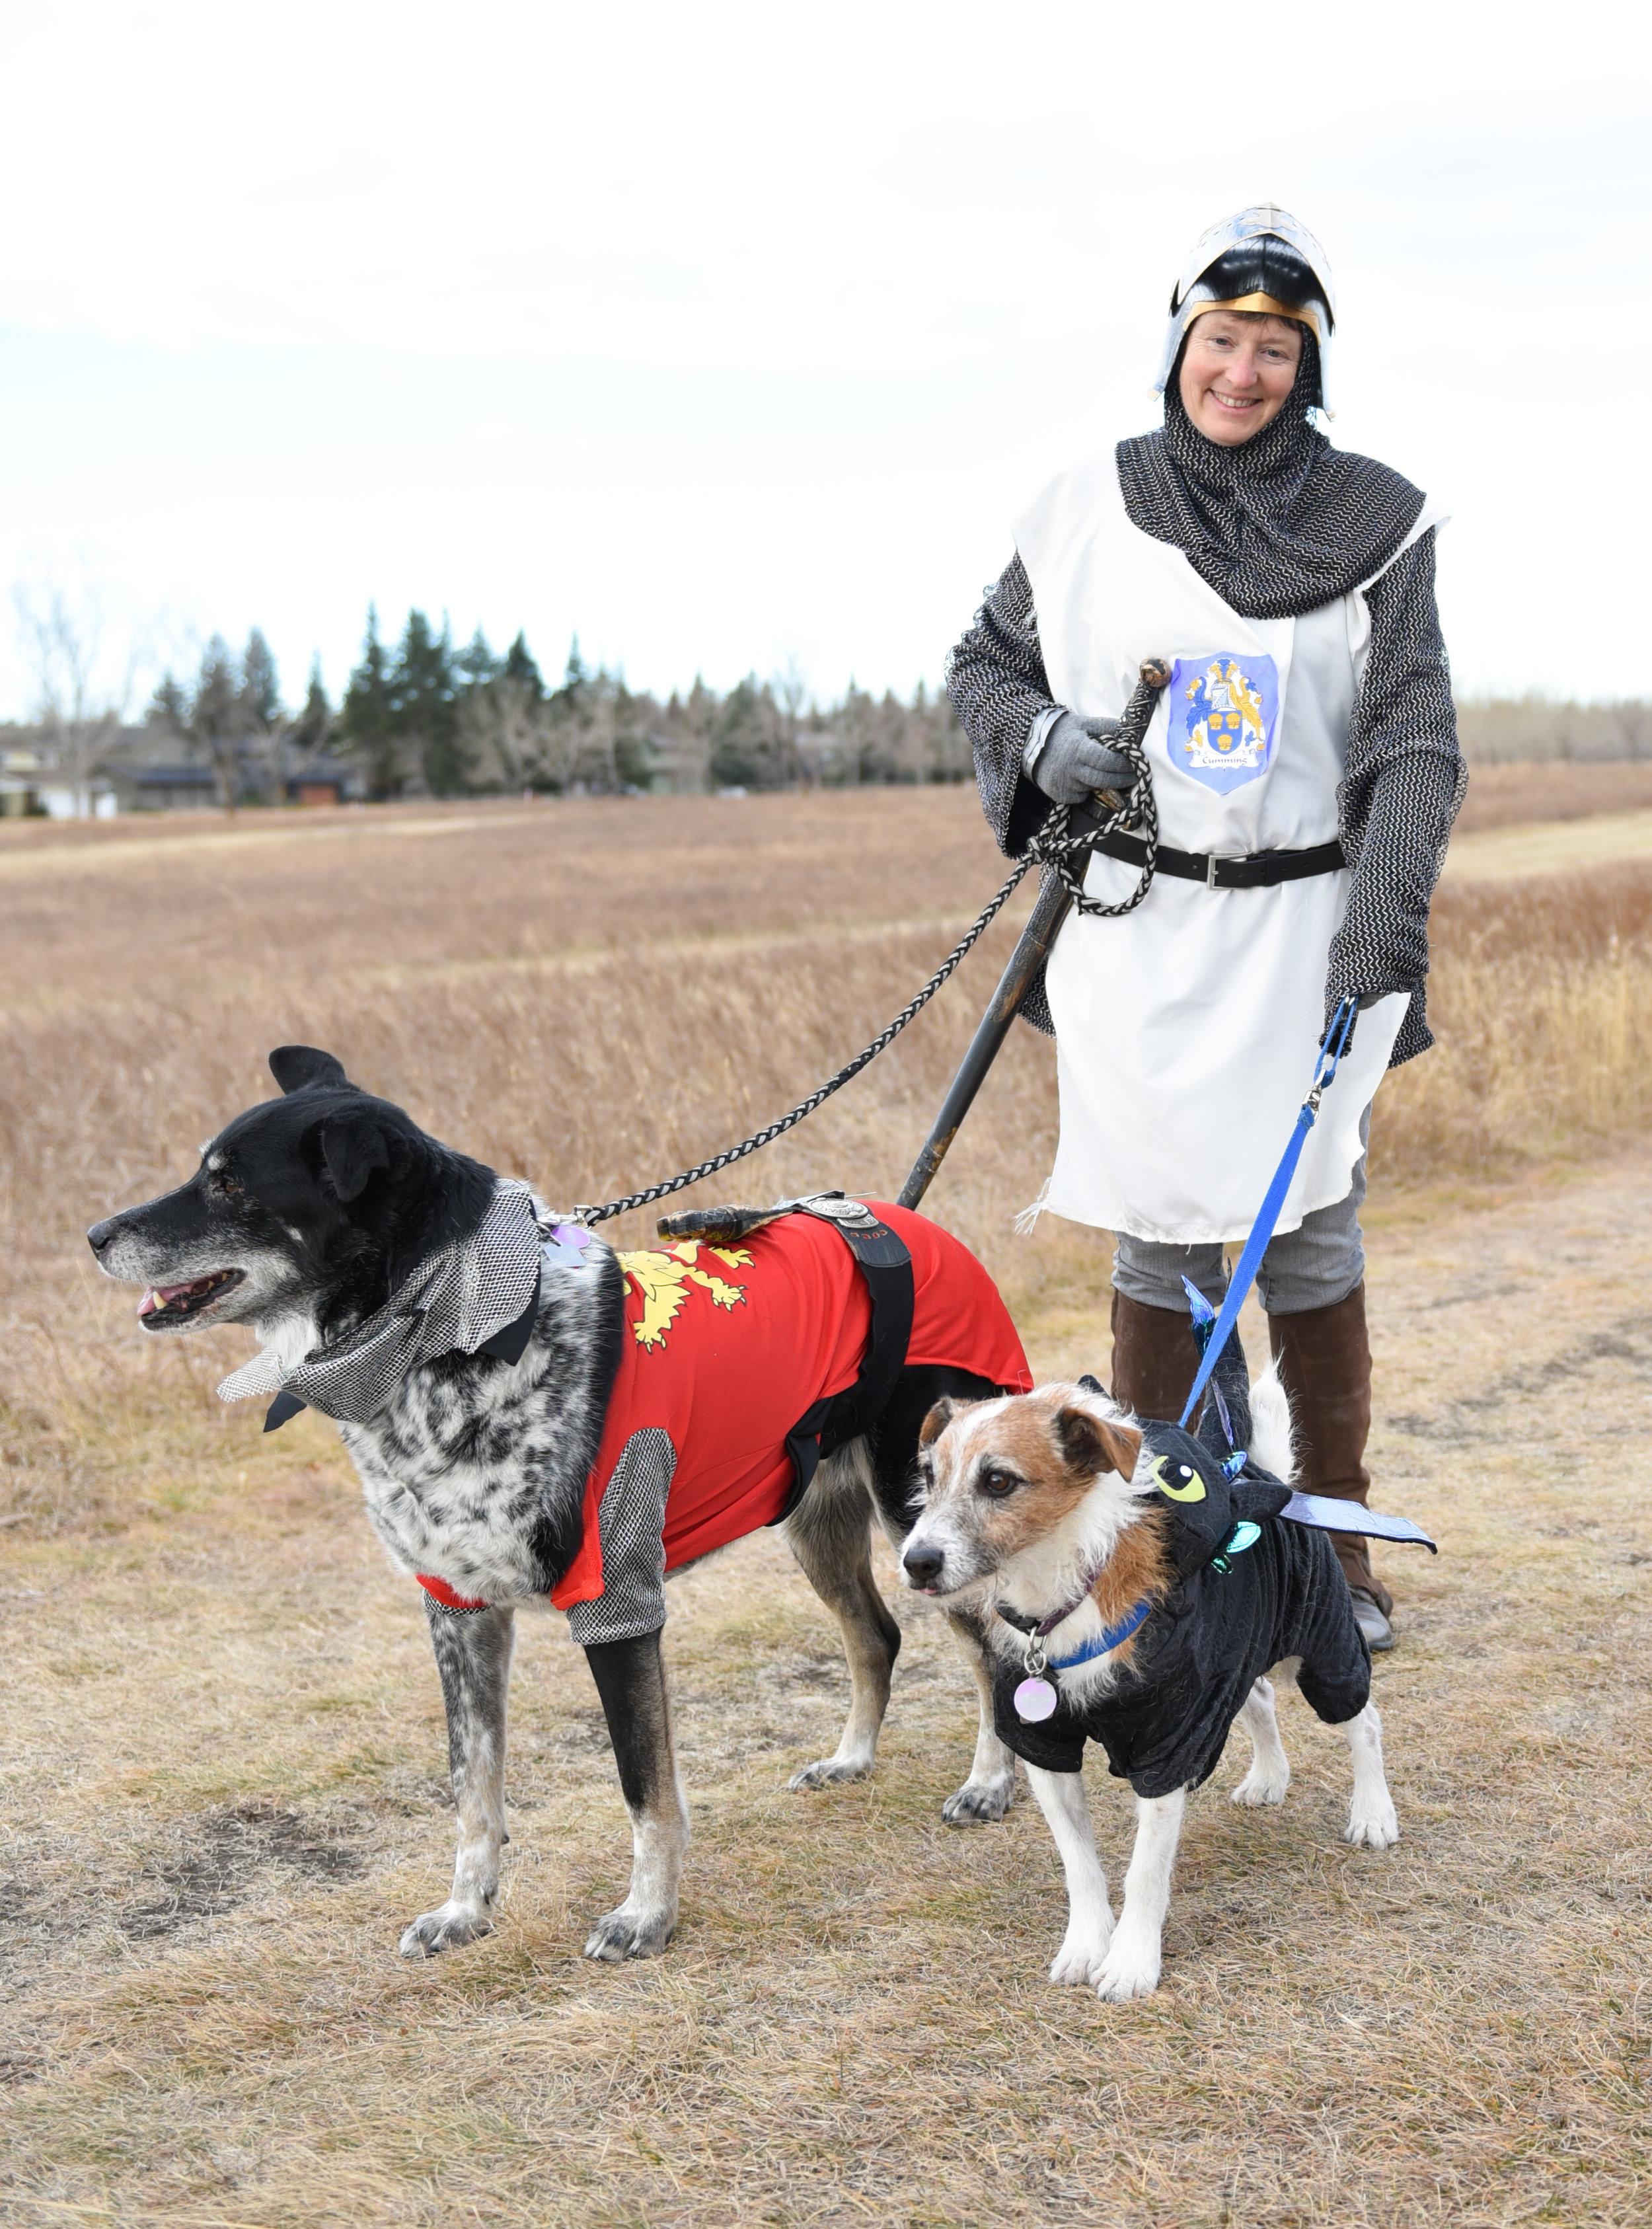 00-20171027 Tails of Help 2017 Howloween Dog Walk SOT 0093.jpg